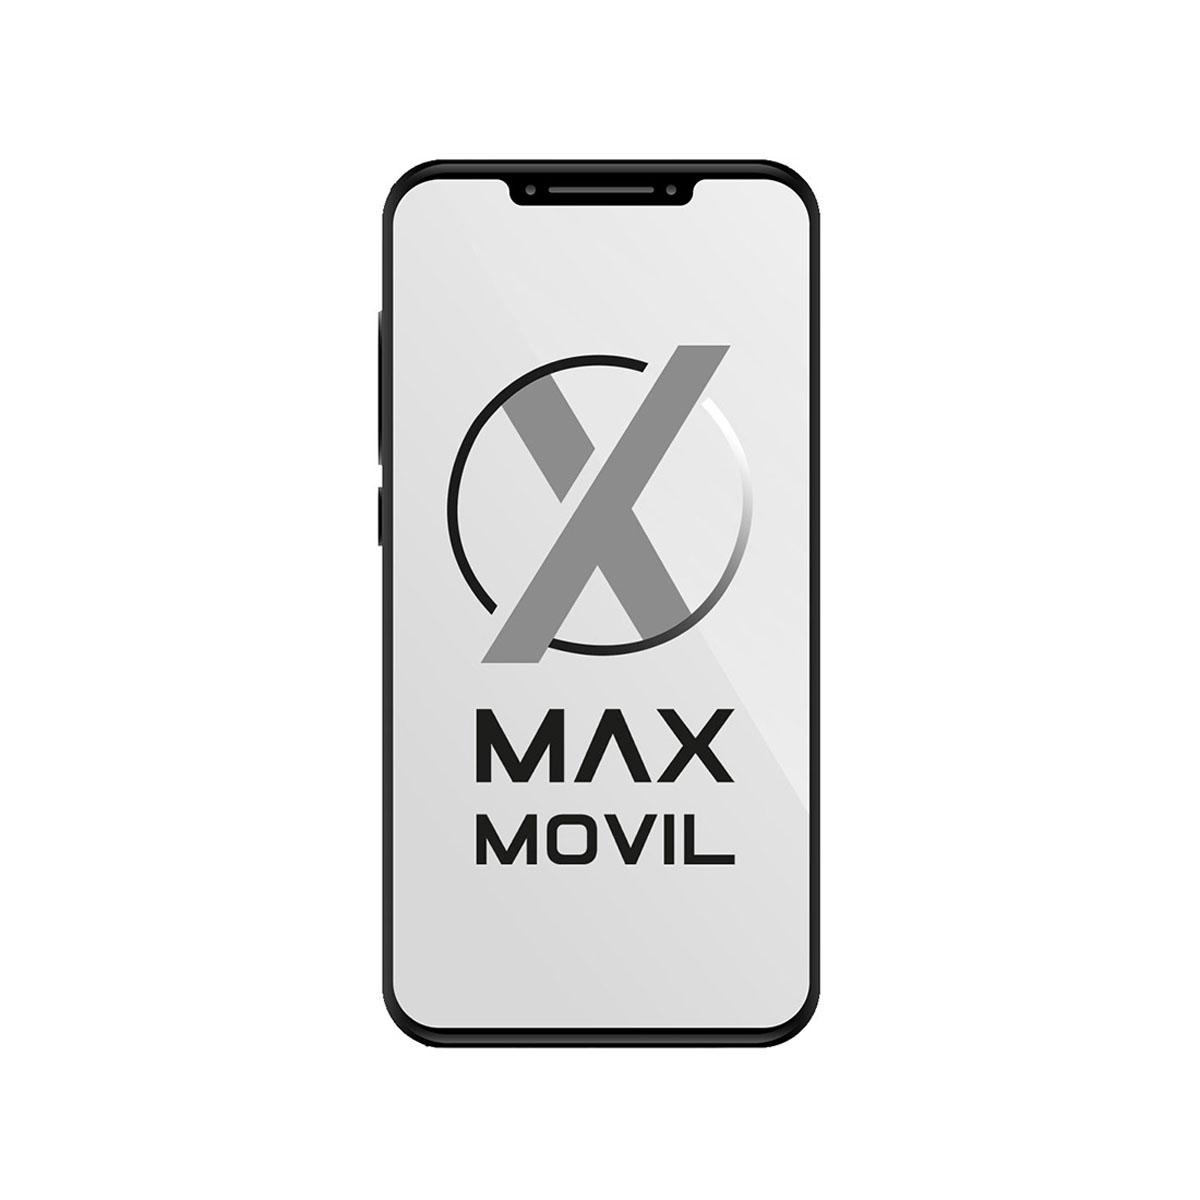 Comprar funda celly universal xxl tipo libro azul para m viles de 5 7 maxmovil - Donde comprar fundas para moviles ...